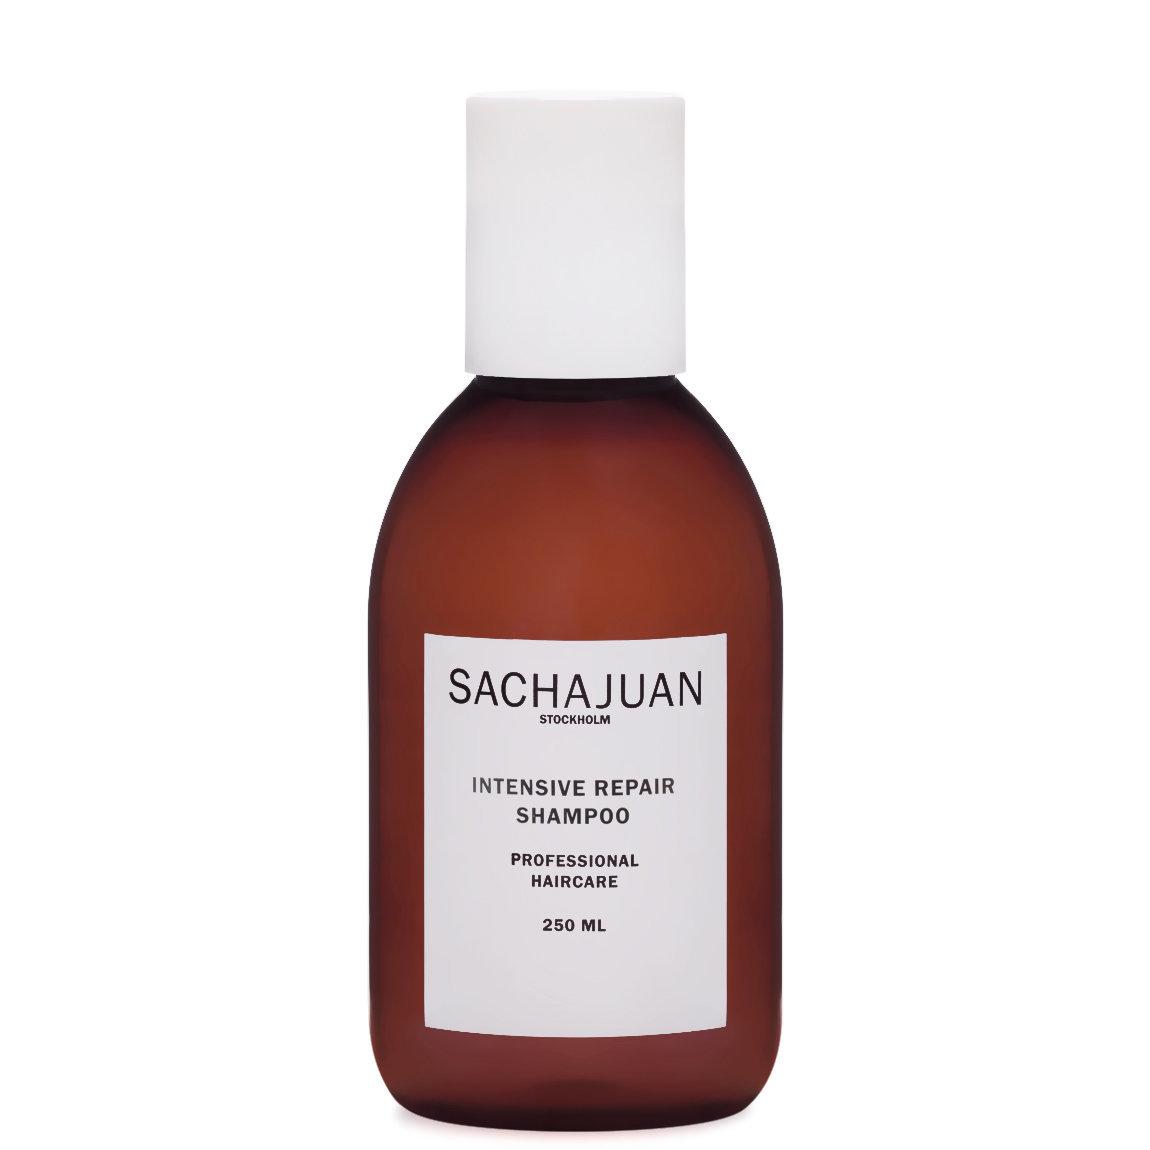 SACHAJUAN Intensive Repair Shampoo product swatch.